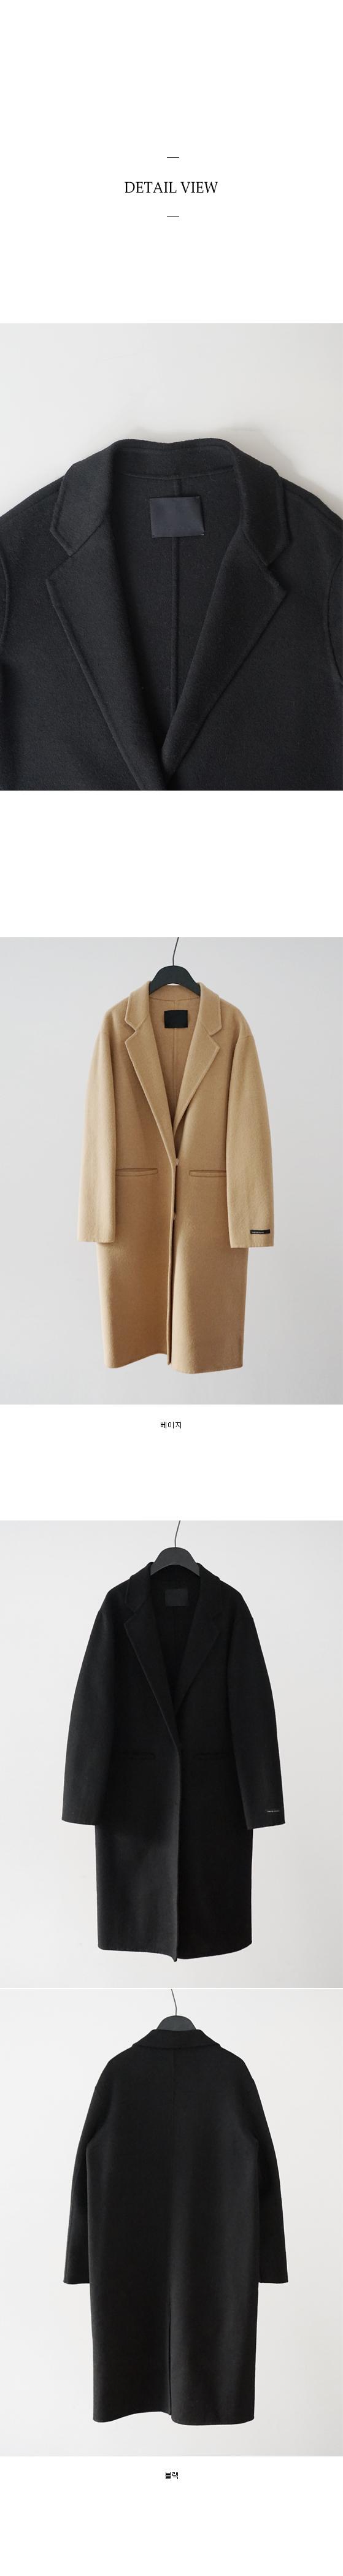 classic mood button coat